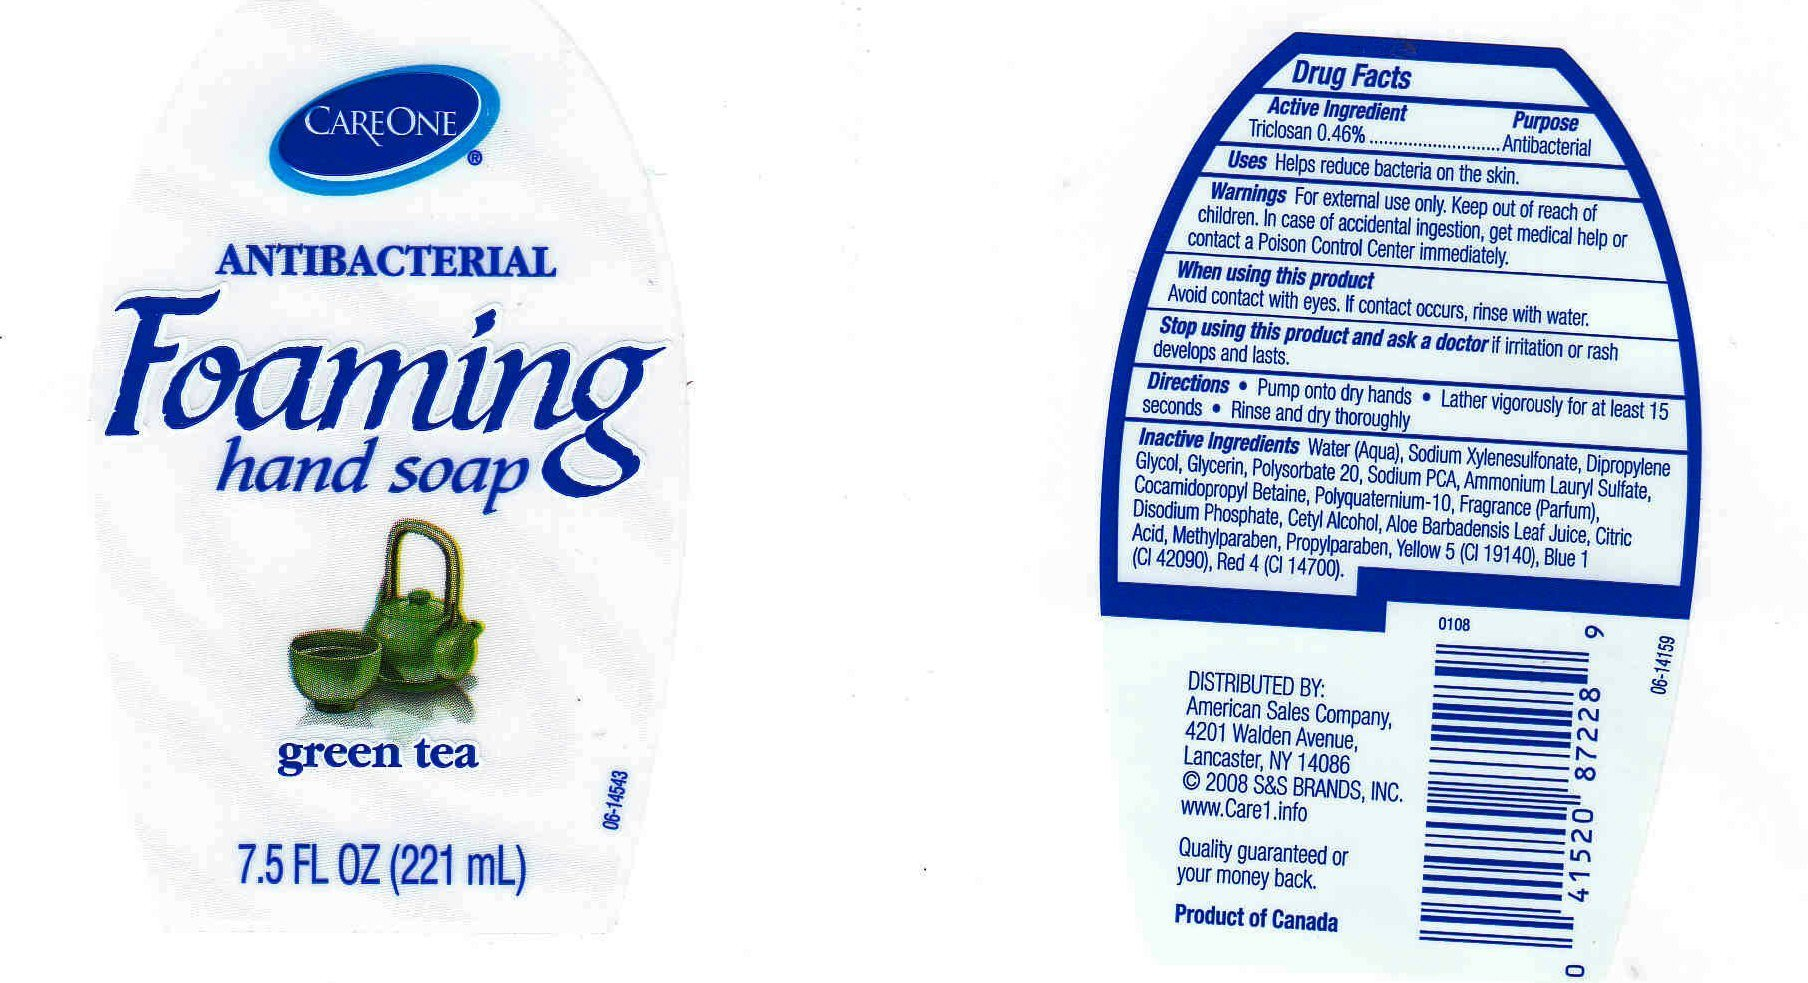 CARE ONE Antibacterial Foaming Hand Soap Green Tea (liquid) Apollo ...